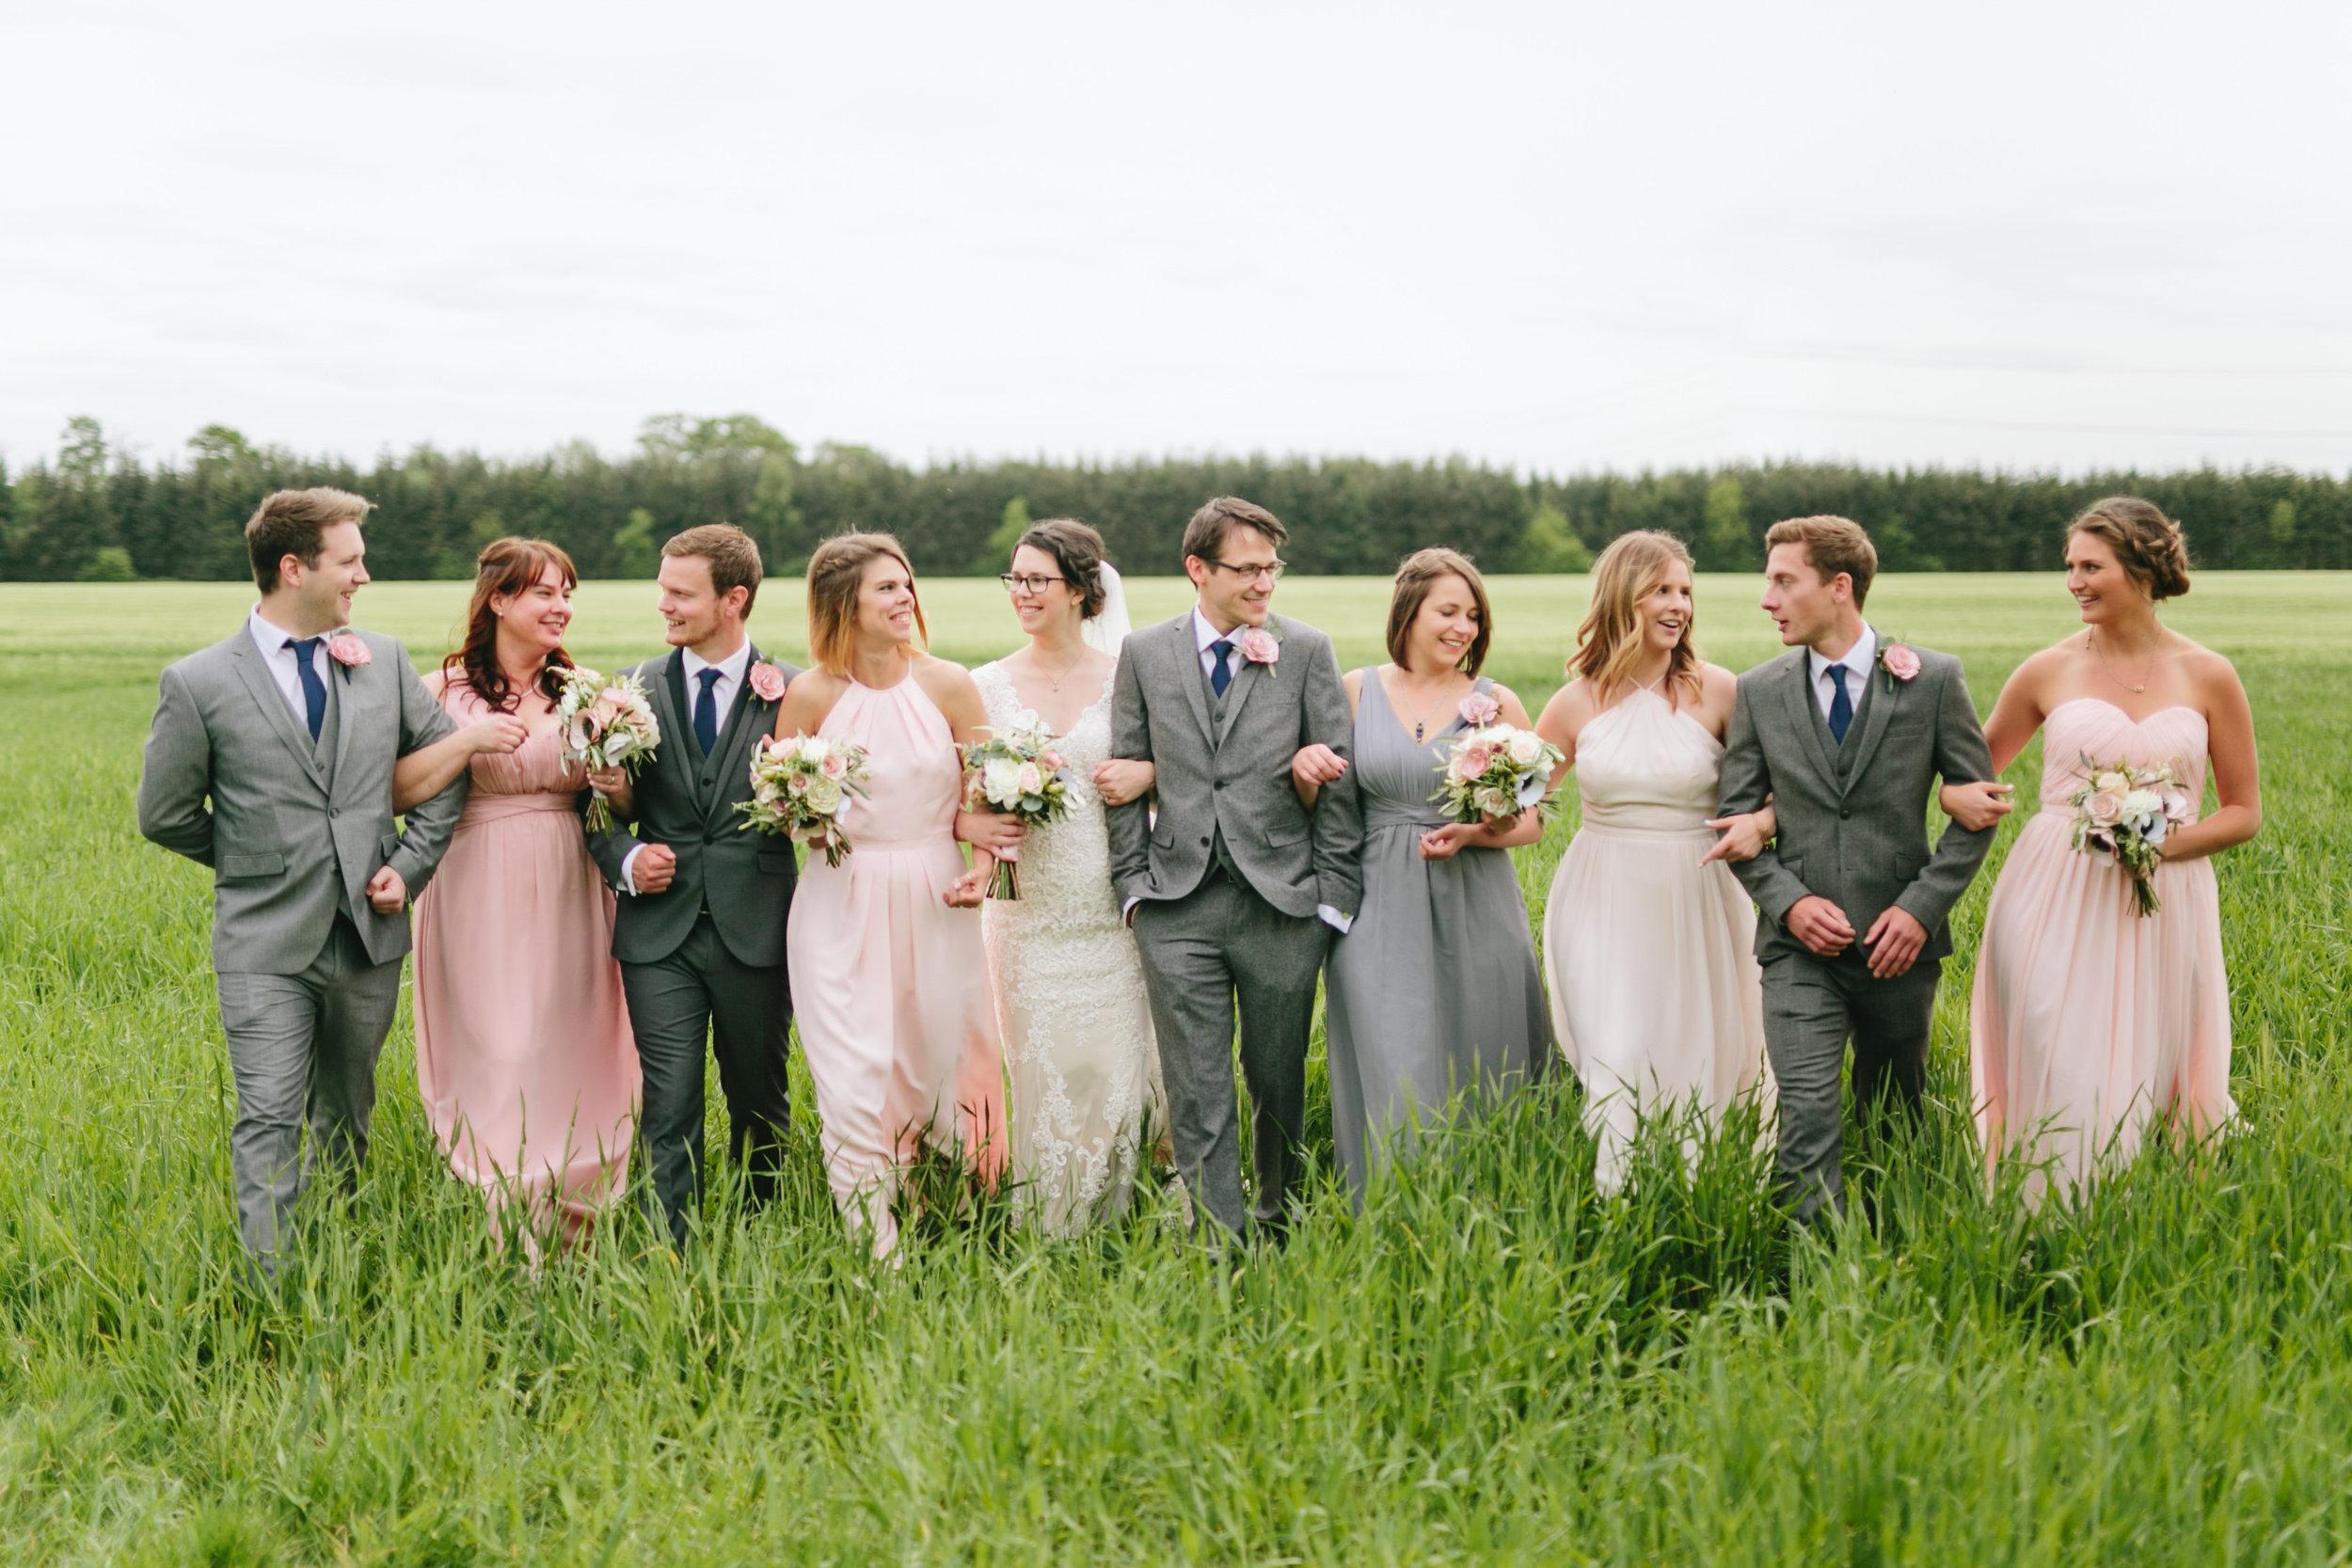 Mix & Match Bridal Party